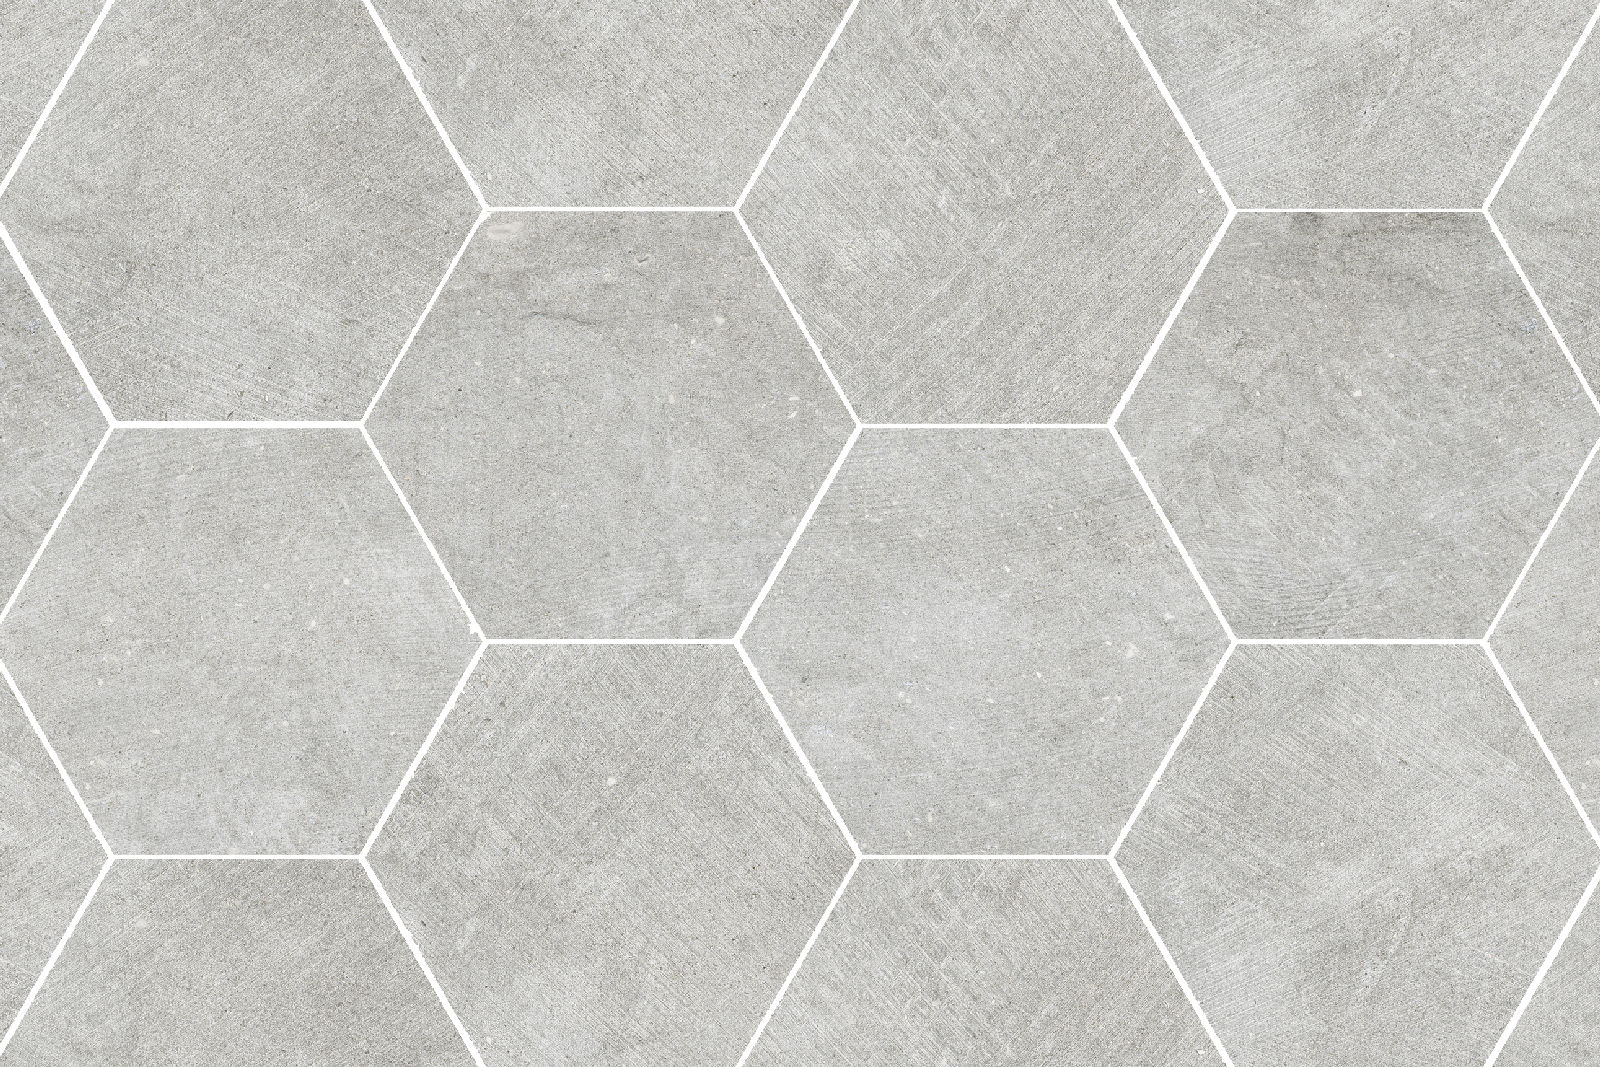 Porcelain Hexagon Floor Tile